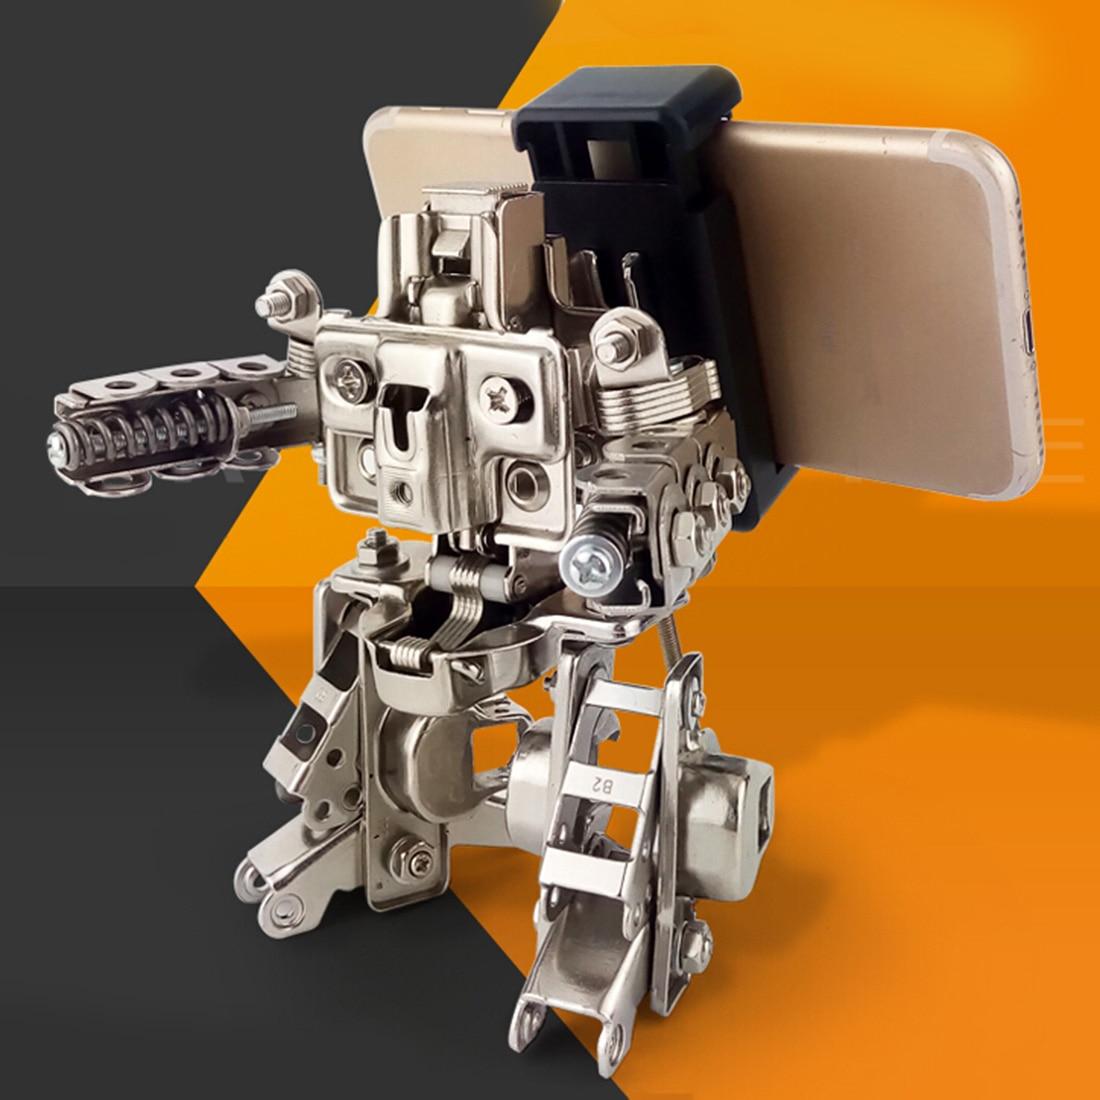 Diy 12 Cm Mecha Lucha Teléfono Ataque Juguete Altura Metal Móvil Figura Montaje Modelo Robot Gran HIEYD29W